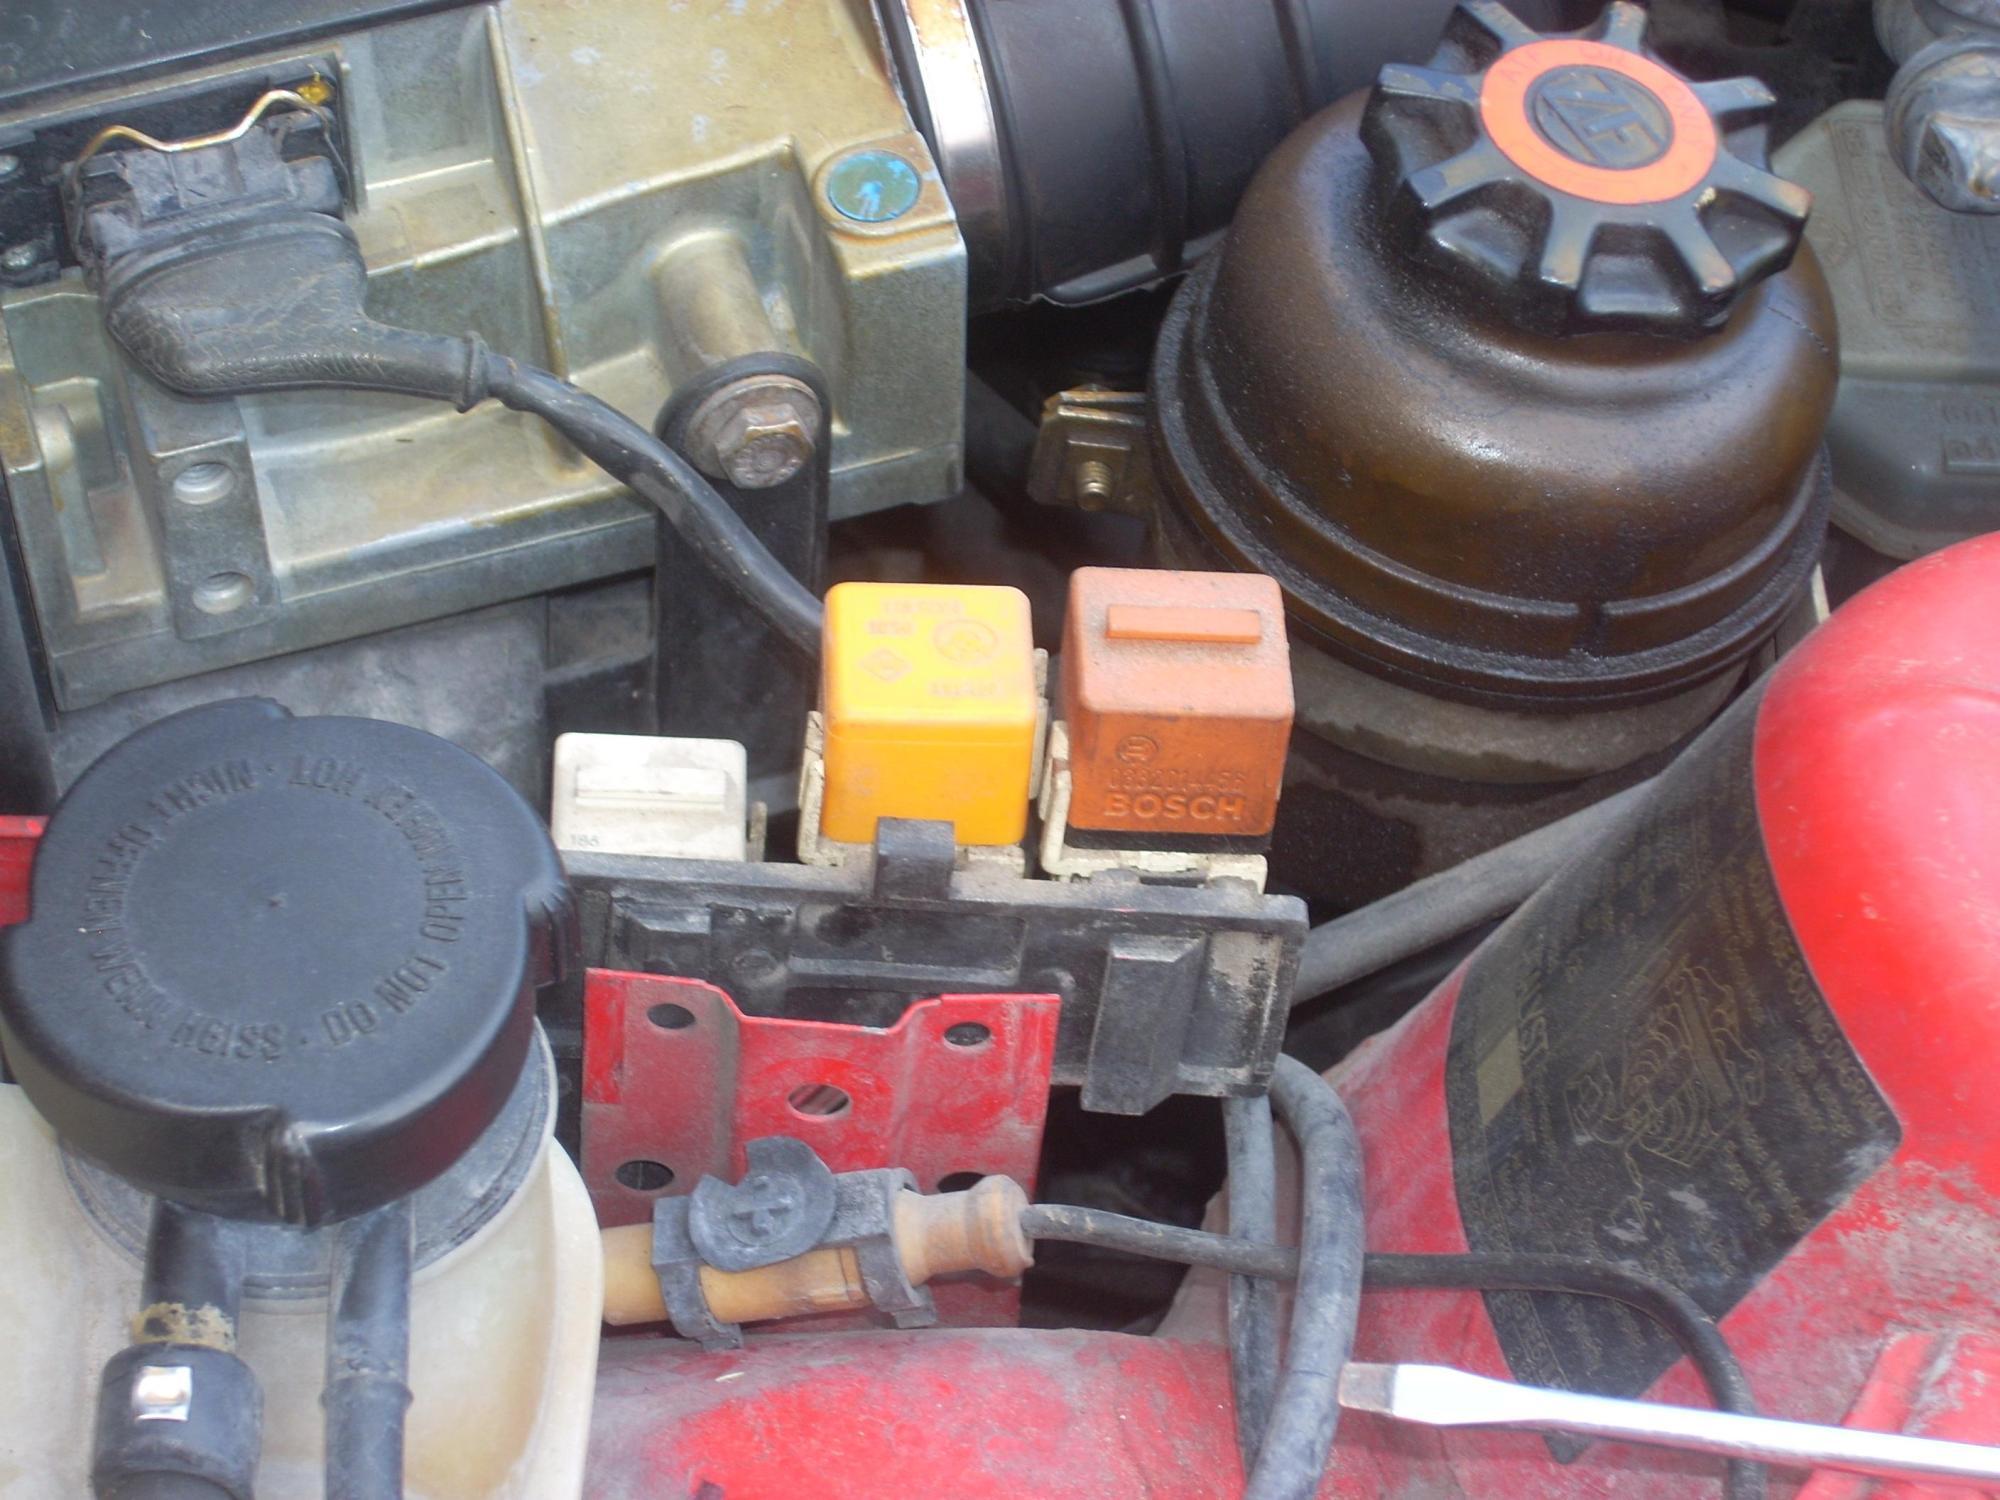 hight resolution of 1993 bmw 325i engine diagram bmw repair manual bmw series e bentleysimiliar bmw ls heat up